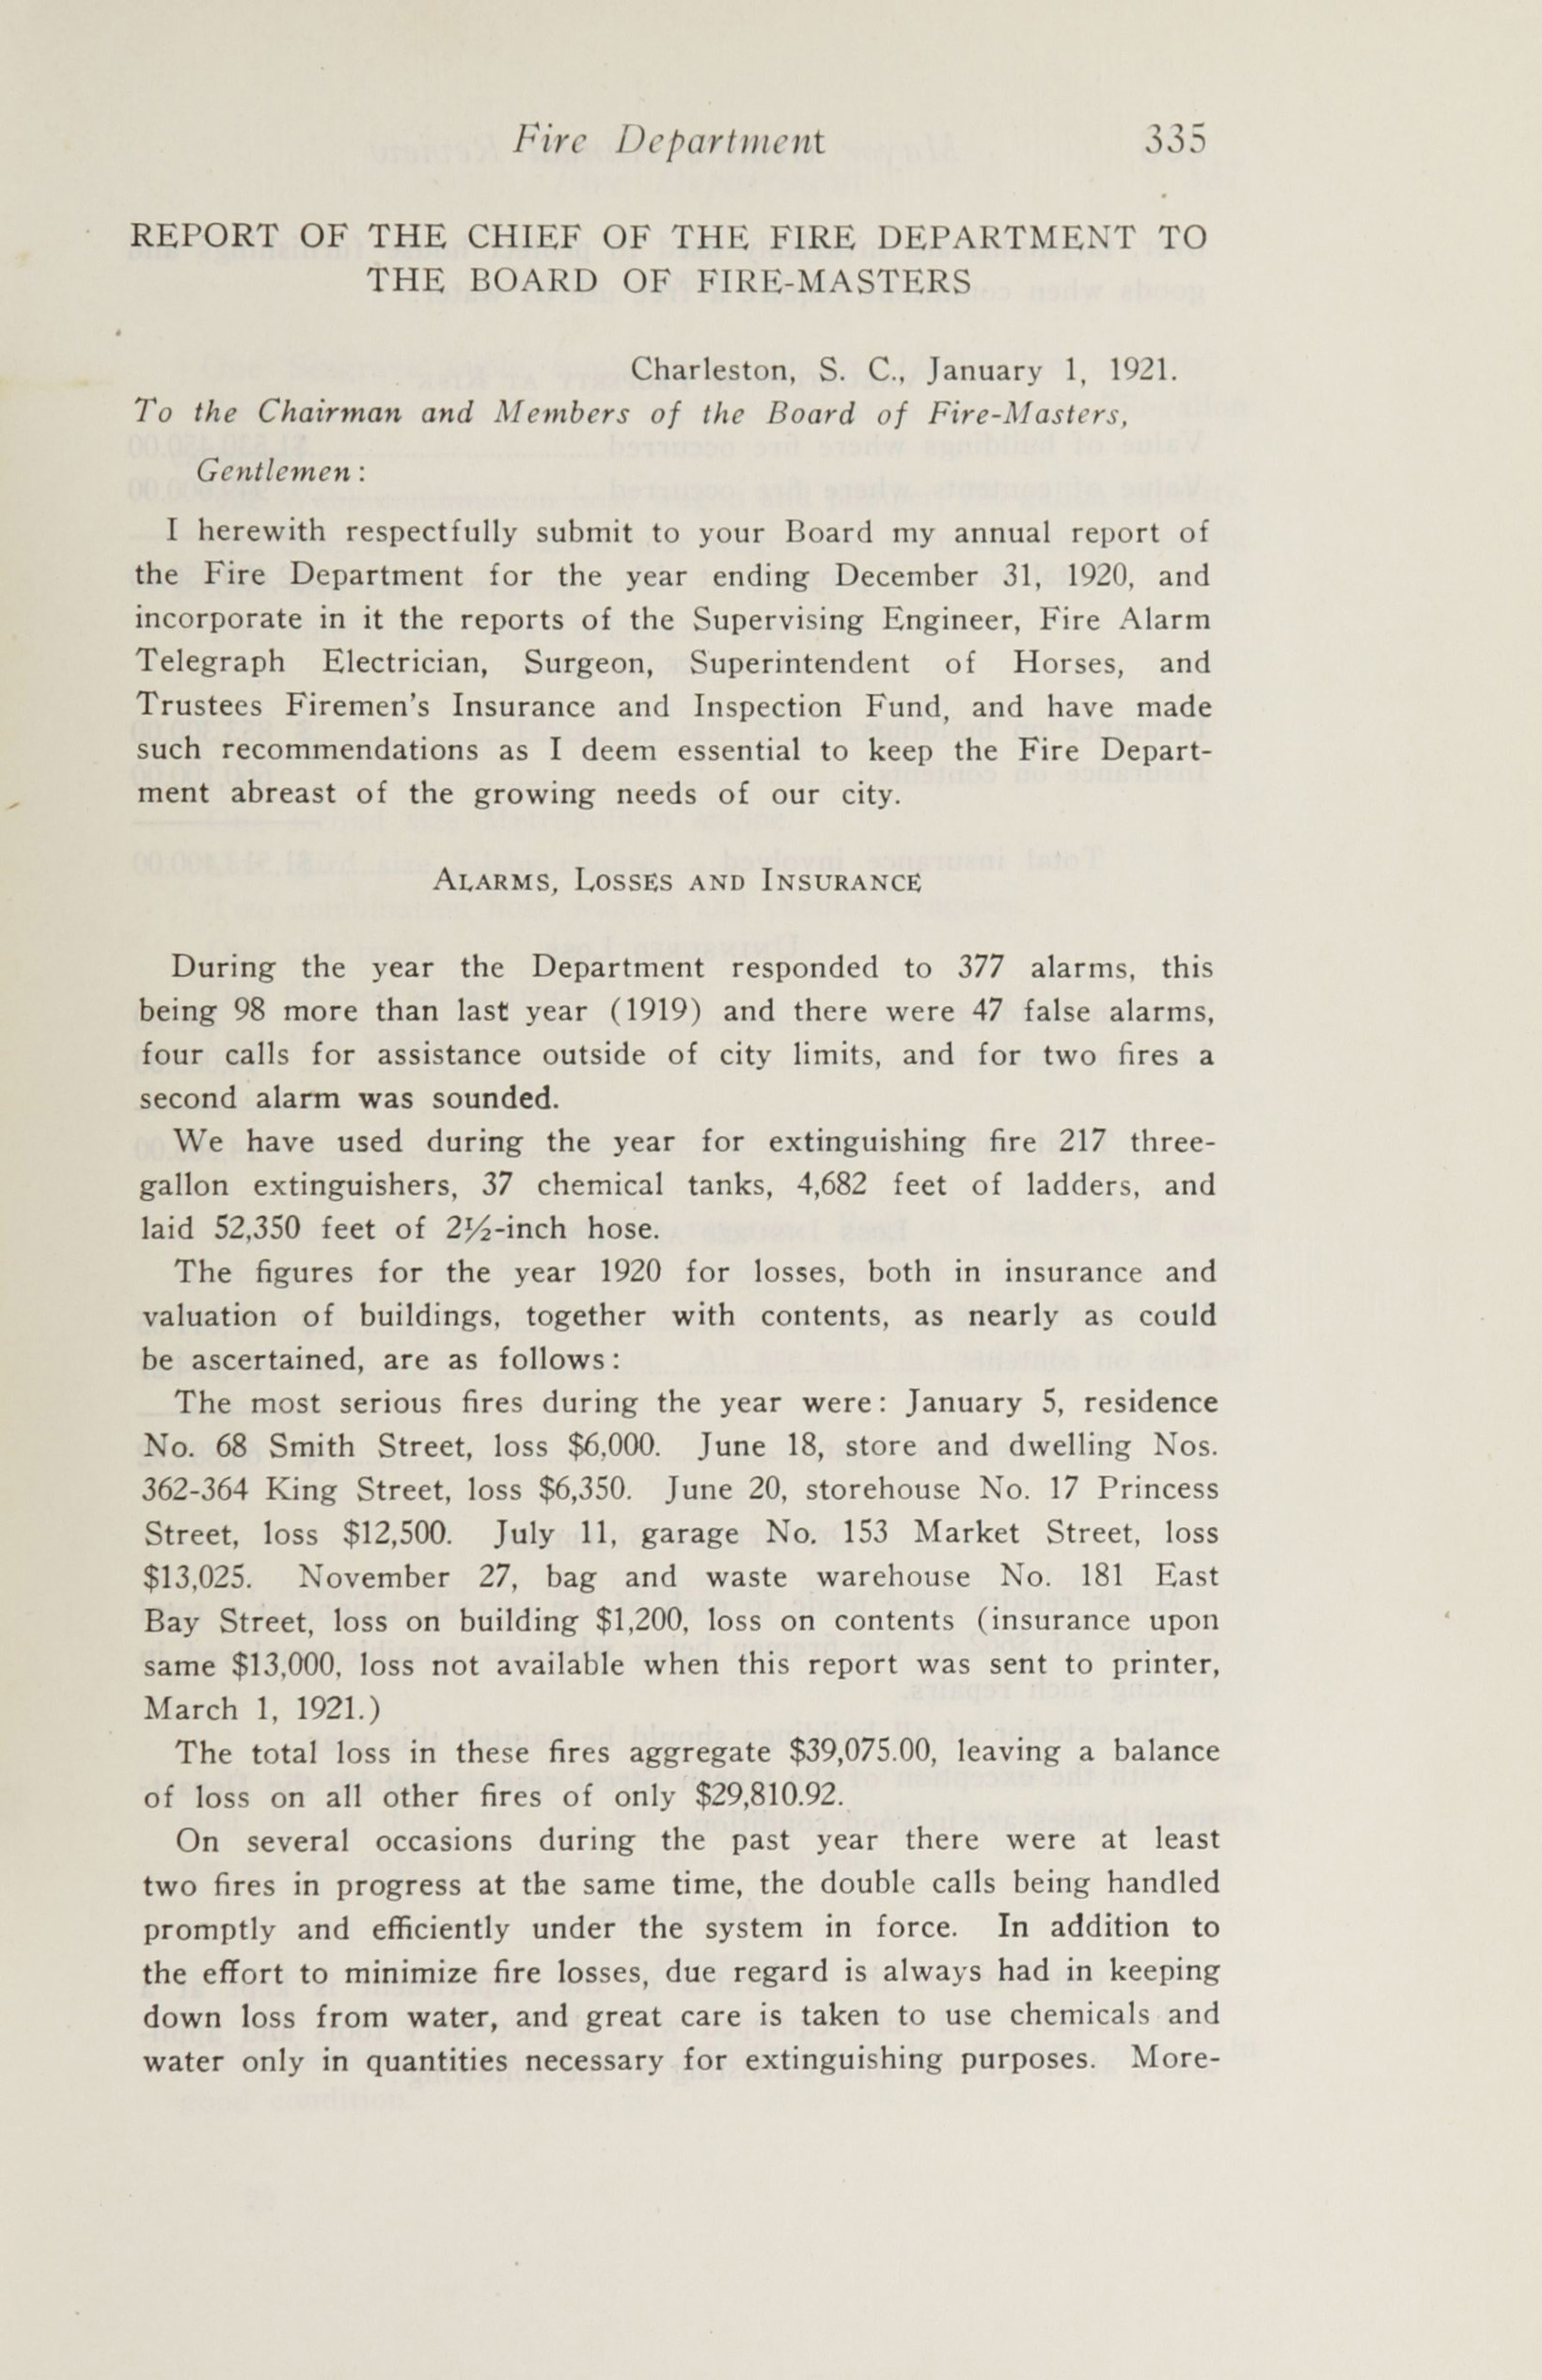 Charleston Yearbook, 1920, page 335